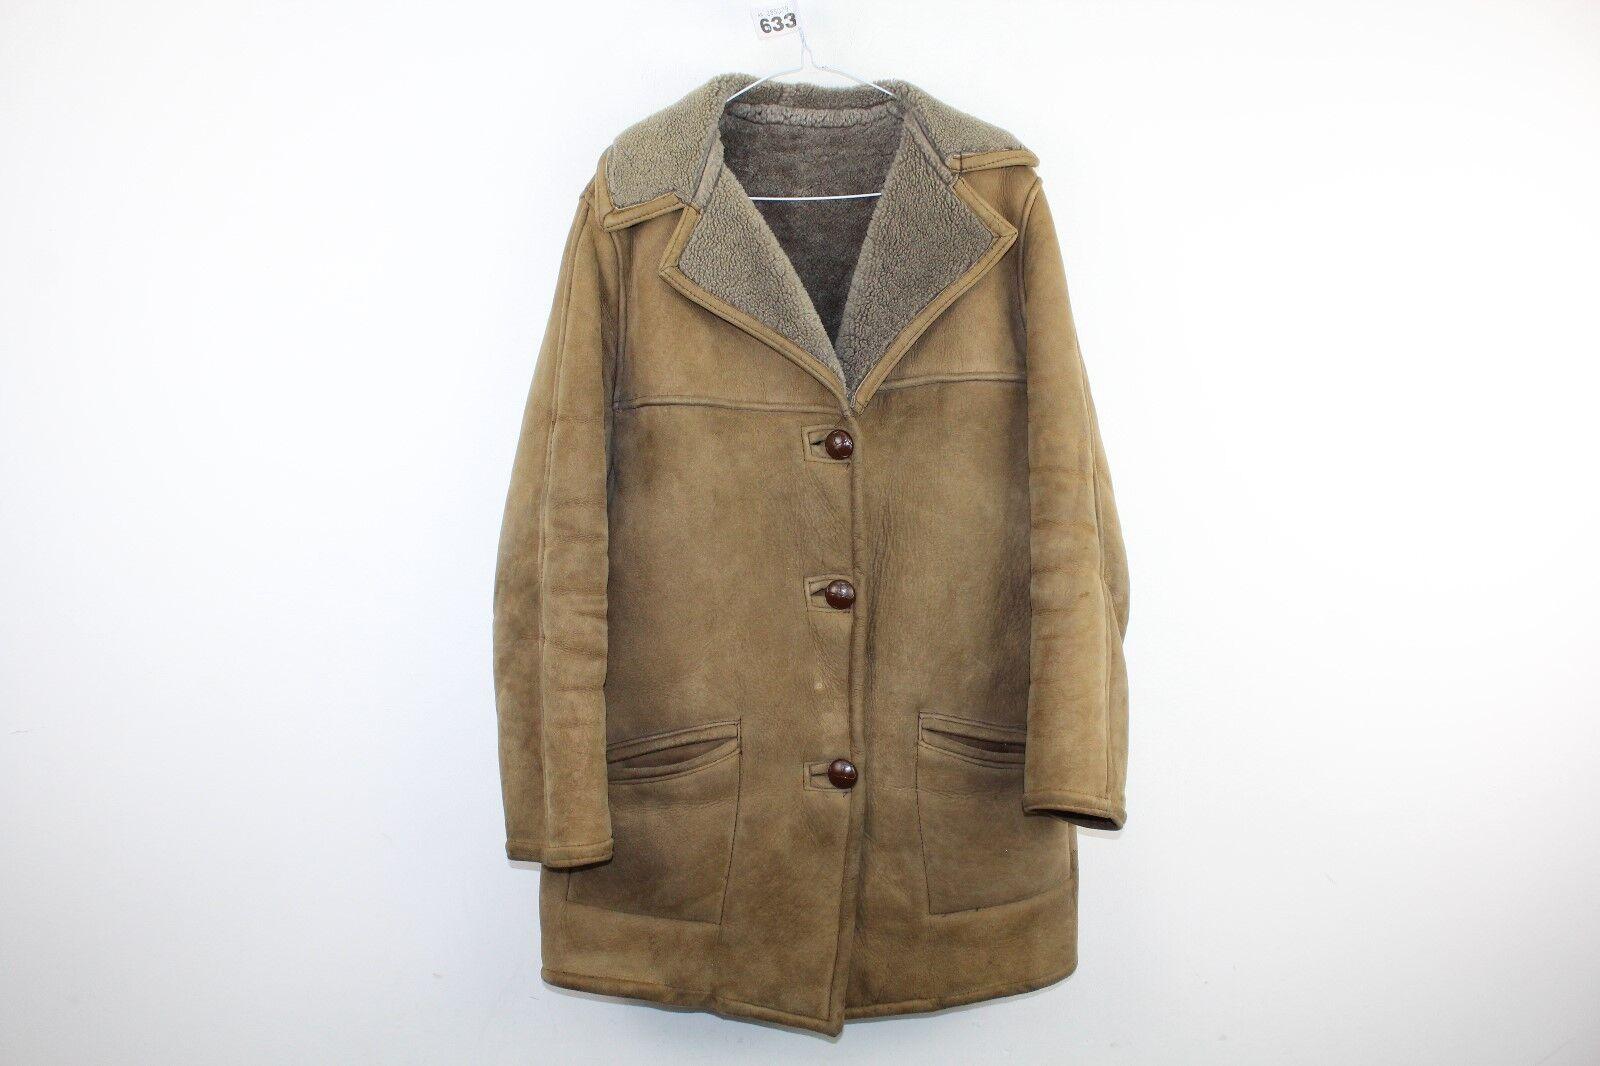 Womens Real Sheepskin Jacket size See Description No.W633 22/2